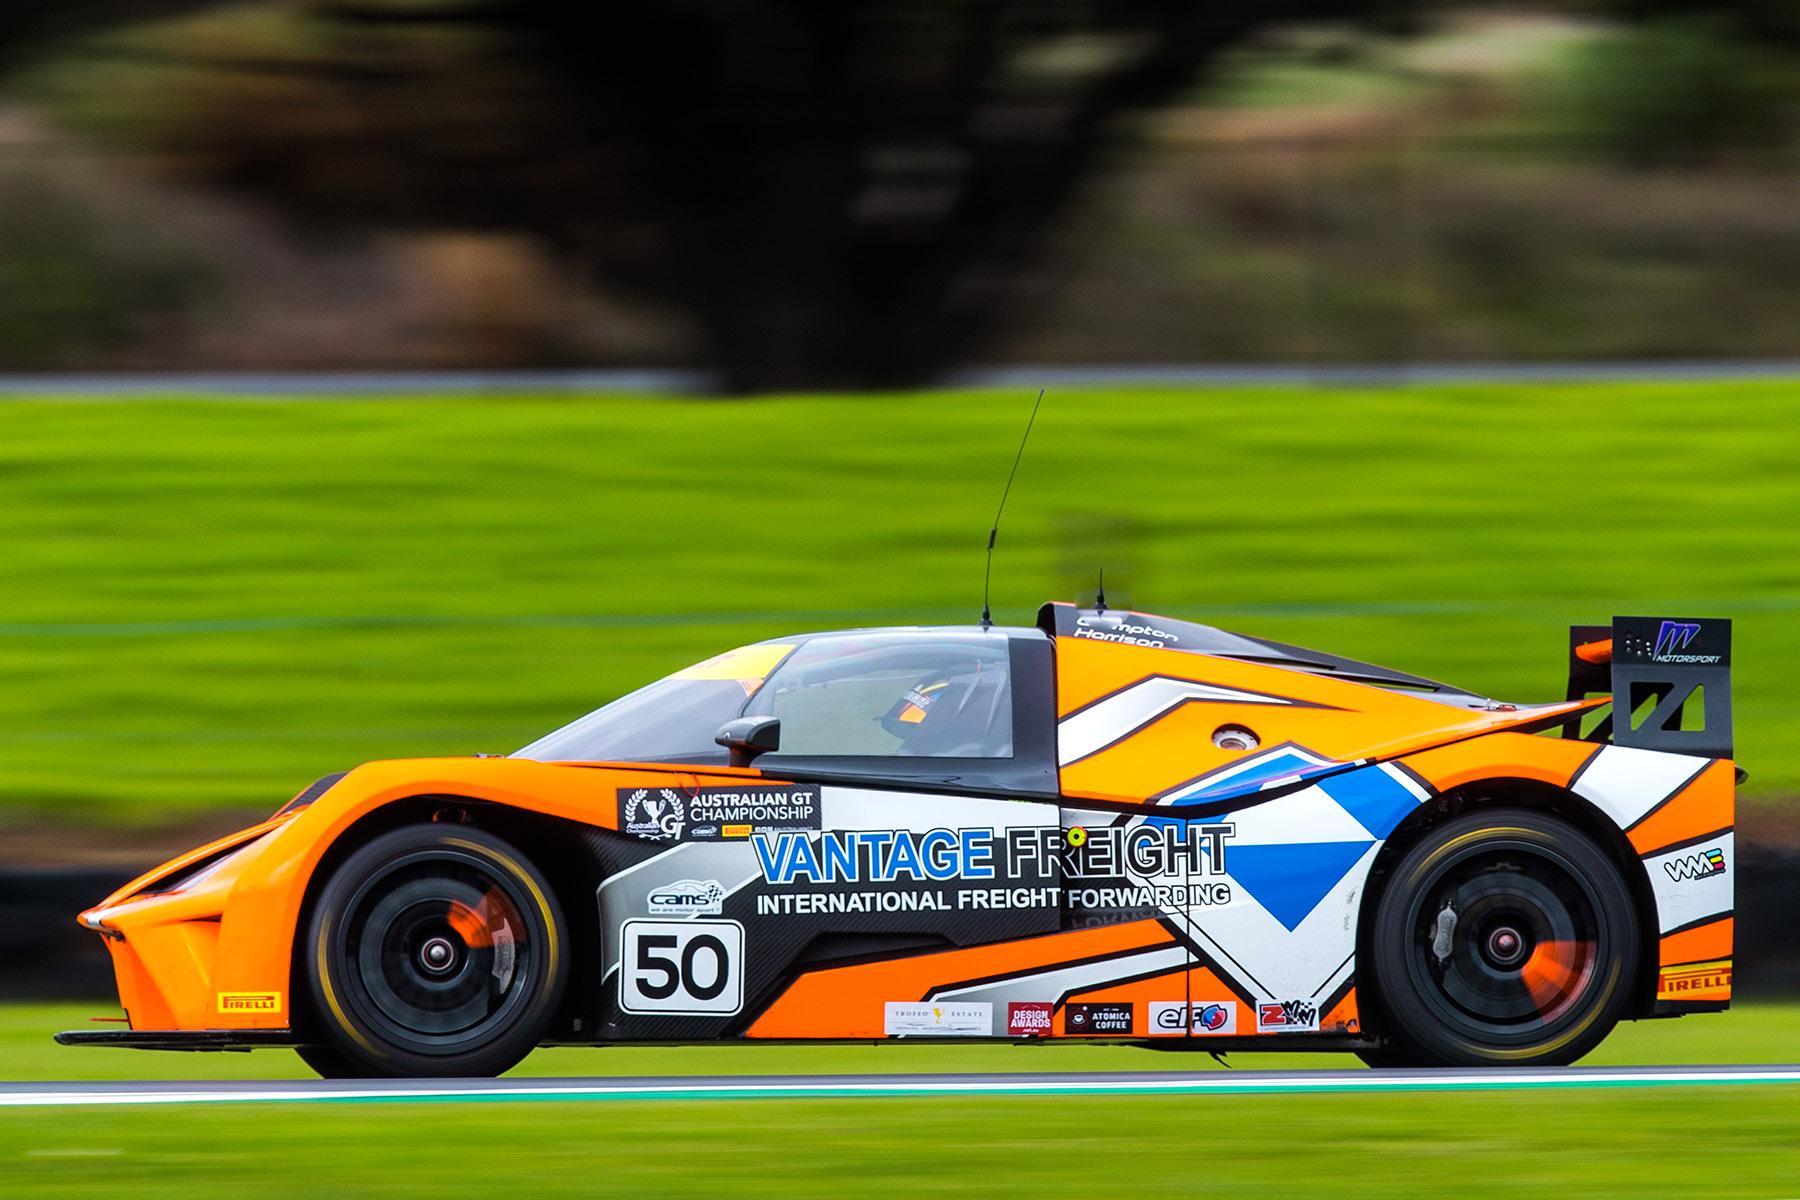 Australian GT prepares for dedicated GT4 events in 2020